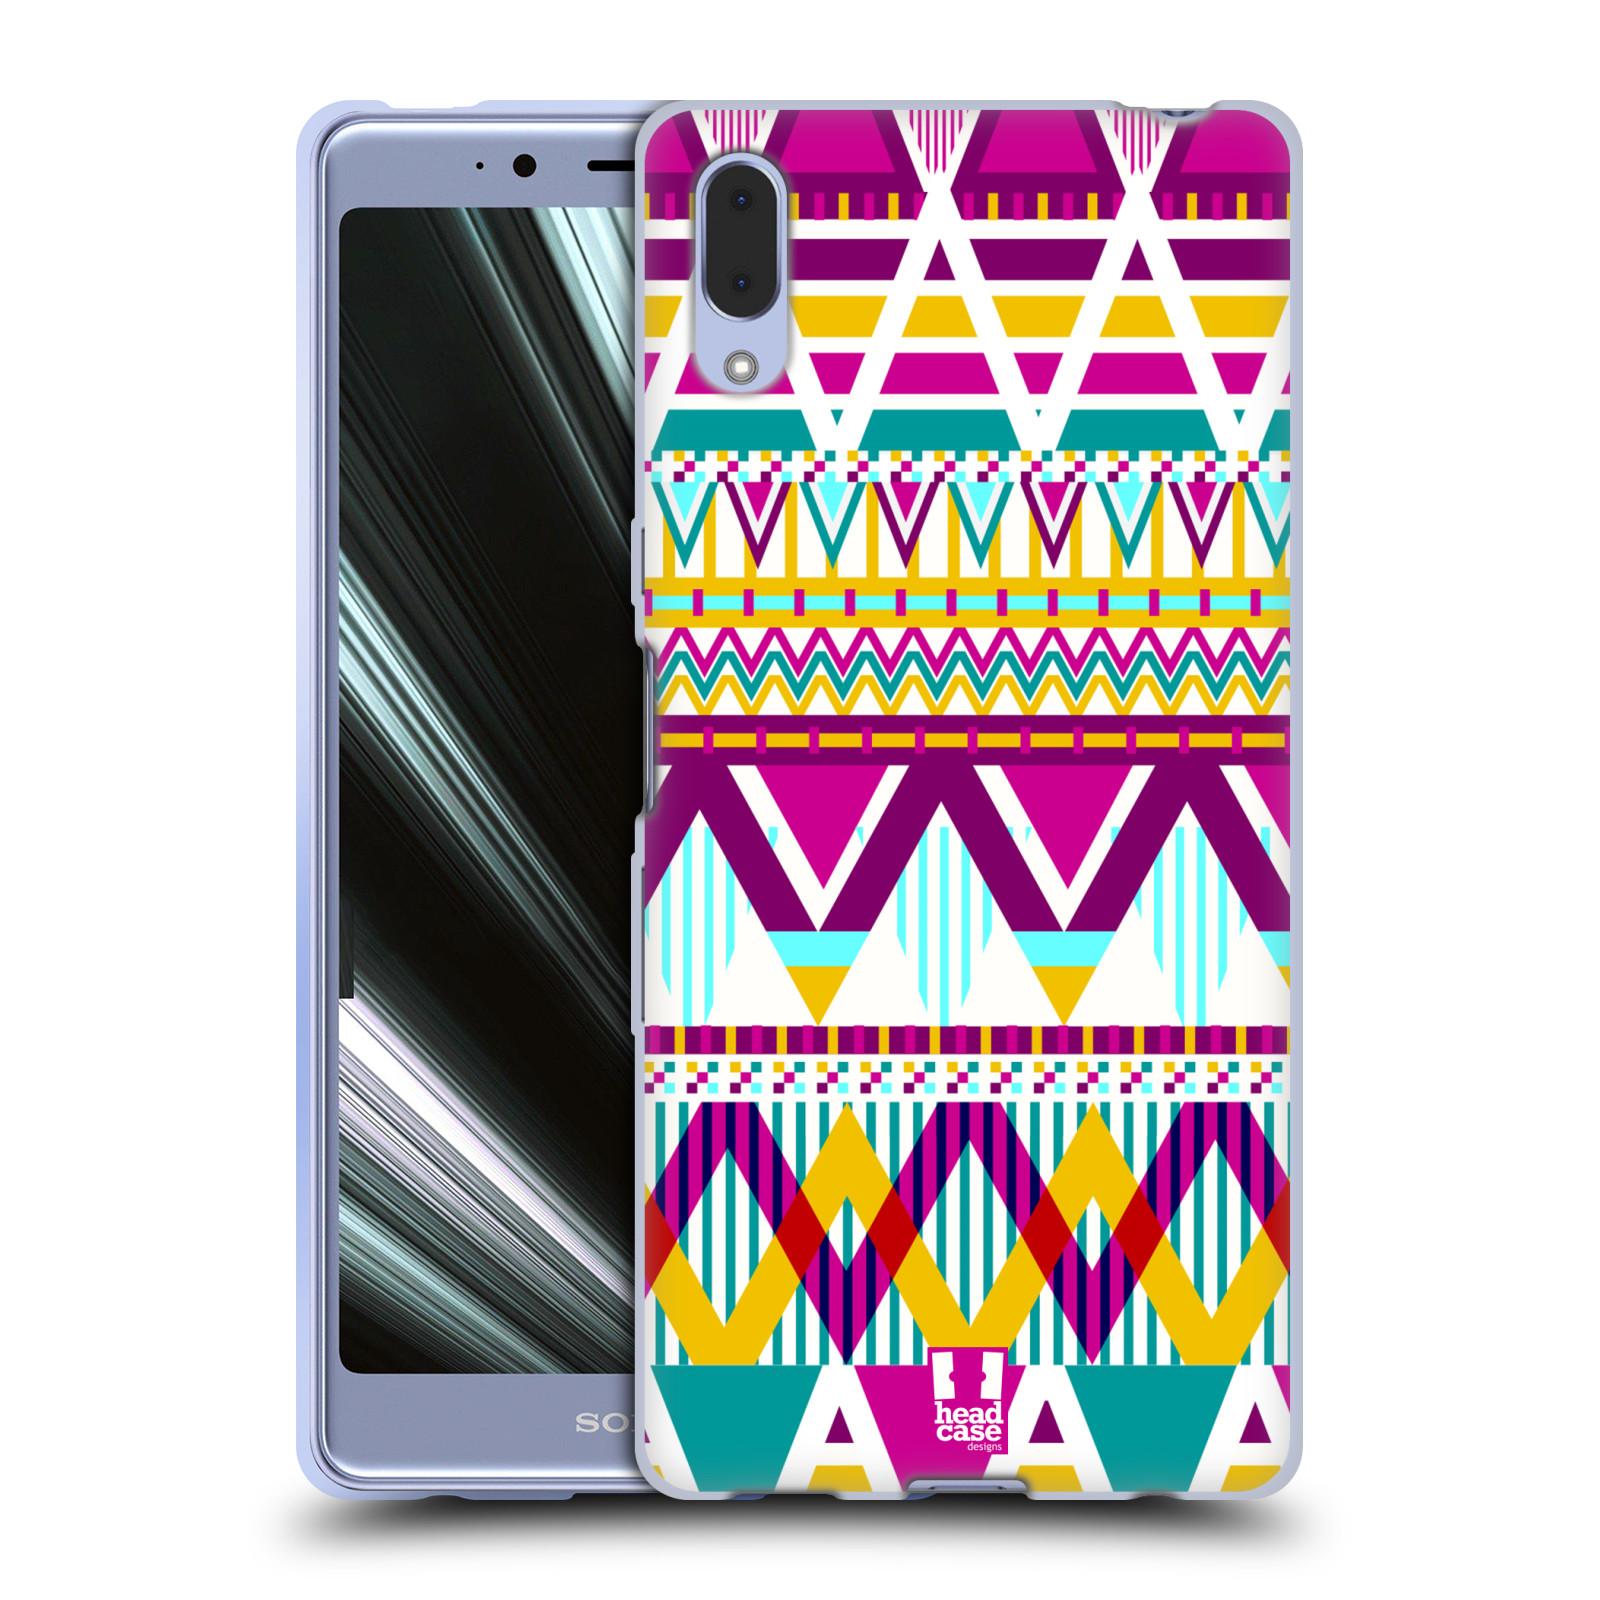 Silikonové pouzdro na mobil Sony Xperia L3 - Head Case - AZTEC SUGARED